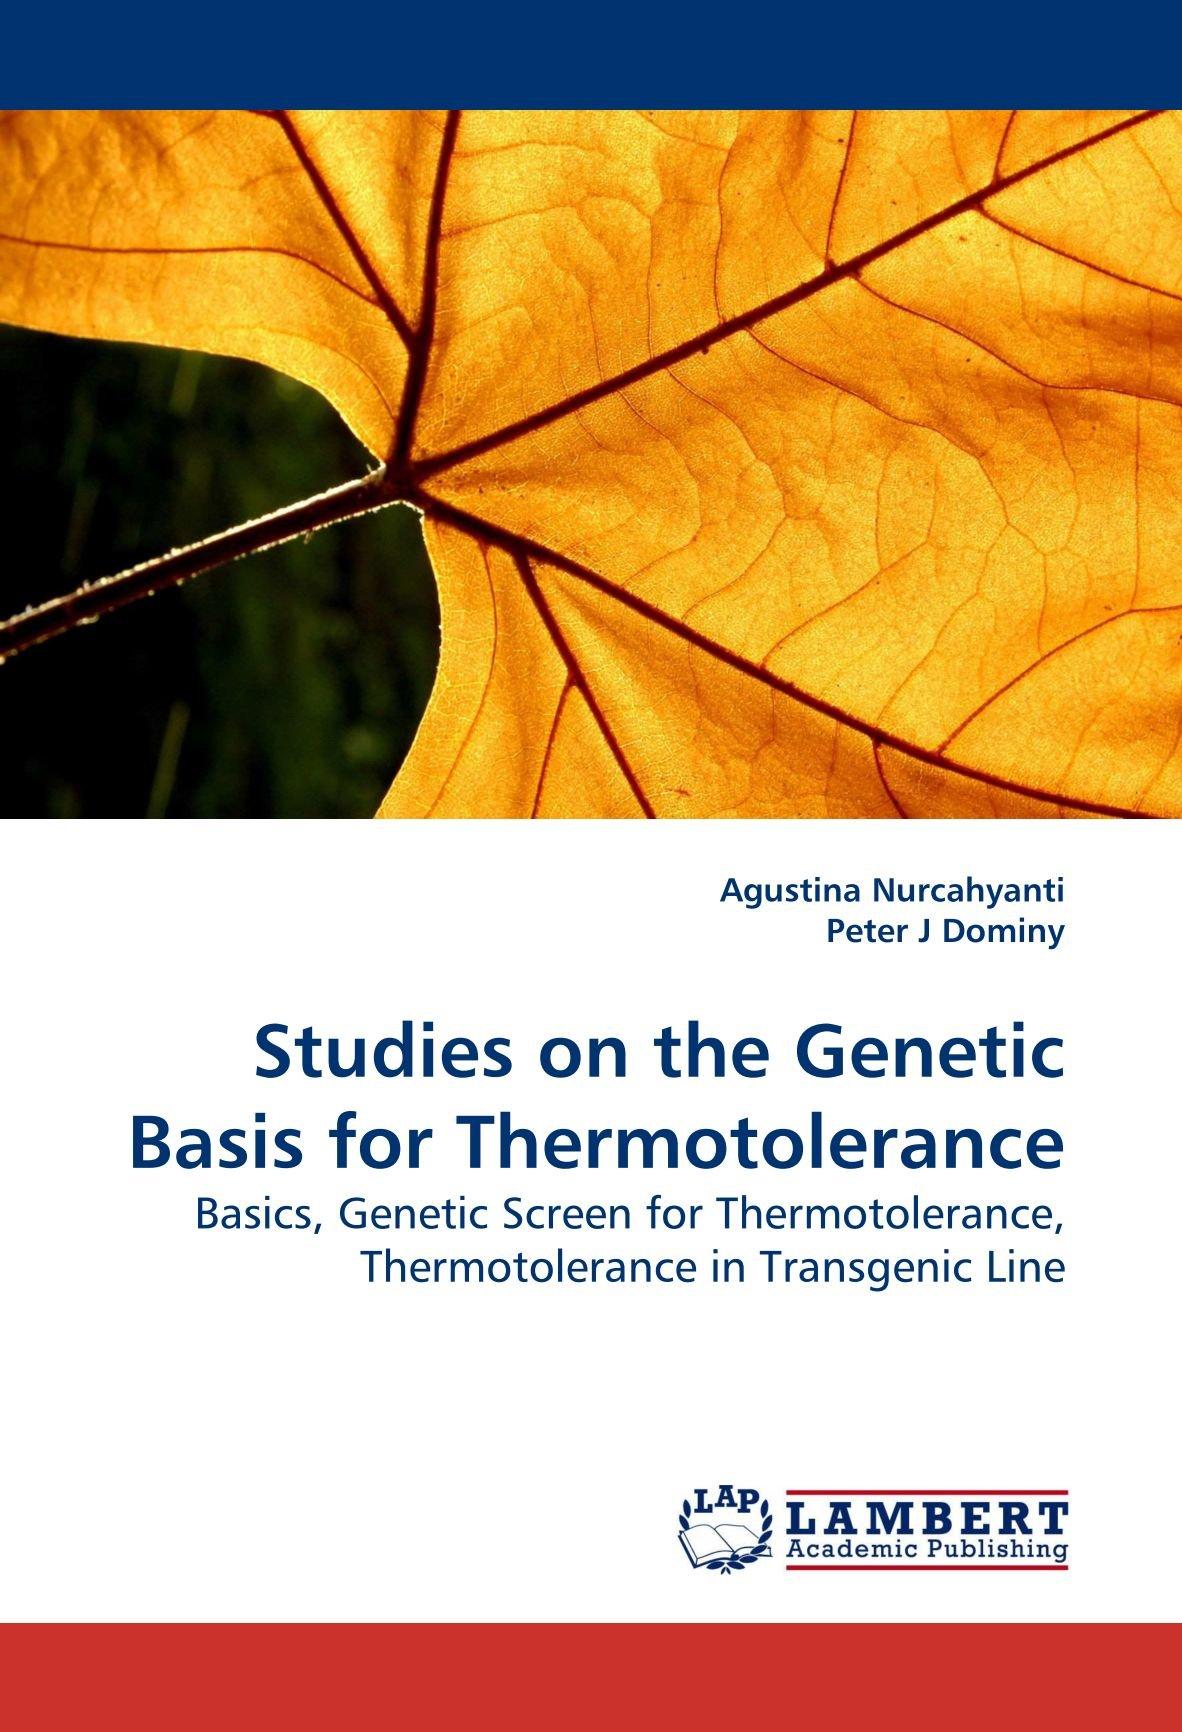 Studies on the Genetic Basis for Thermotolerance: Basics, Genetic Screen for Thermotolerance, Thermotolerance in Transgenic Line PDF